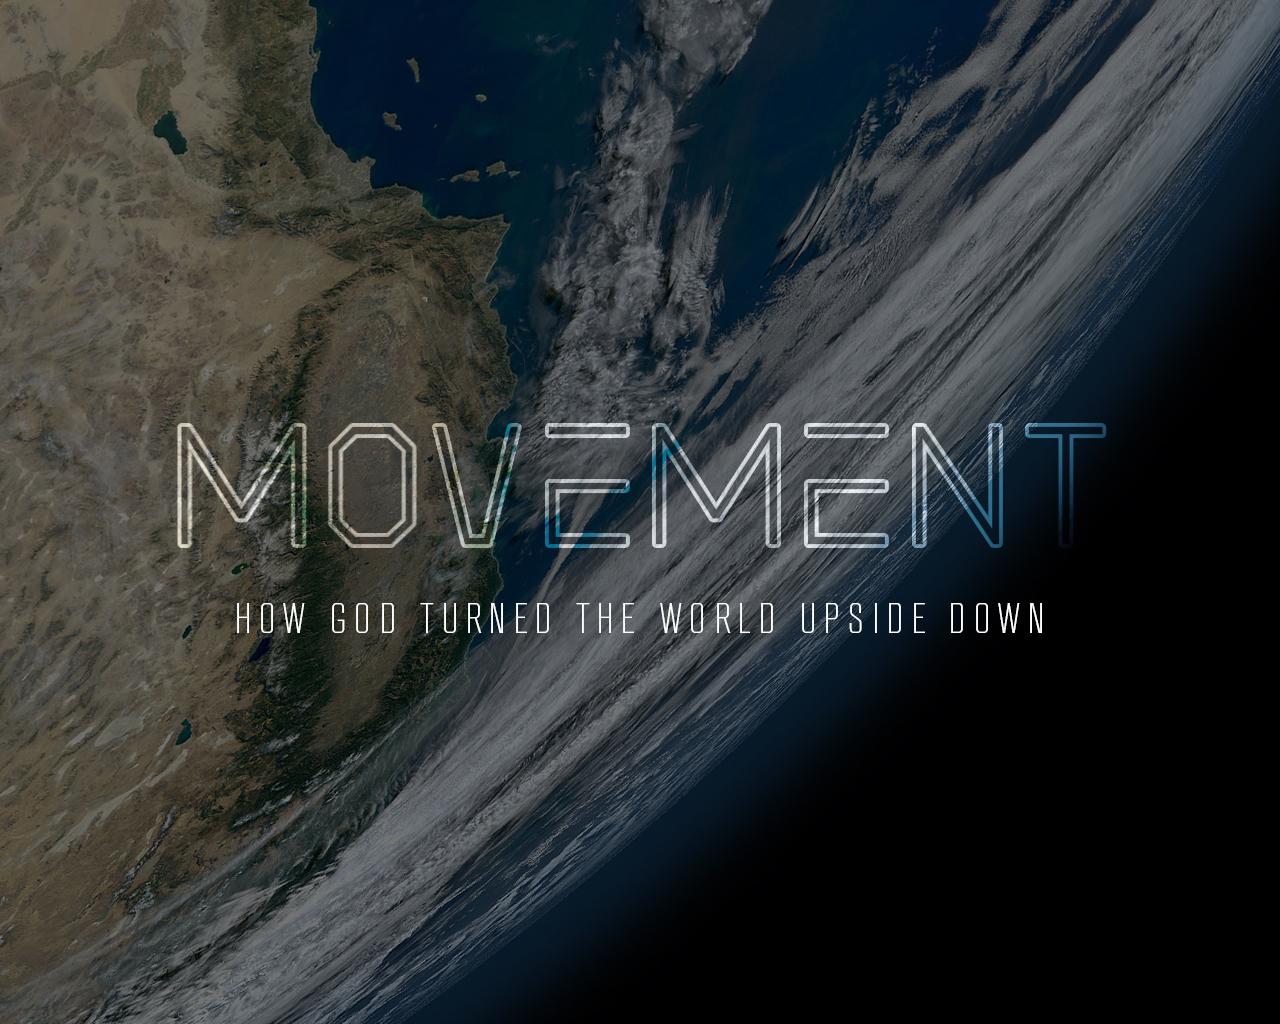 movement2.jpg